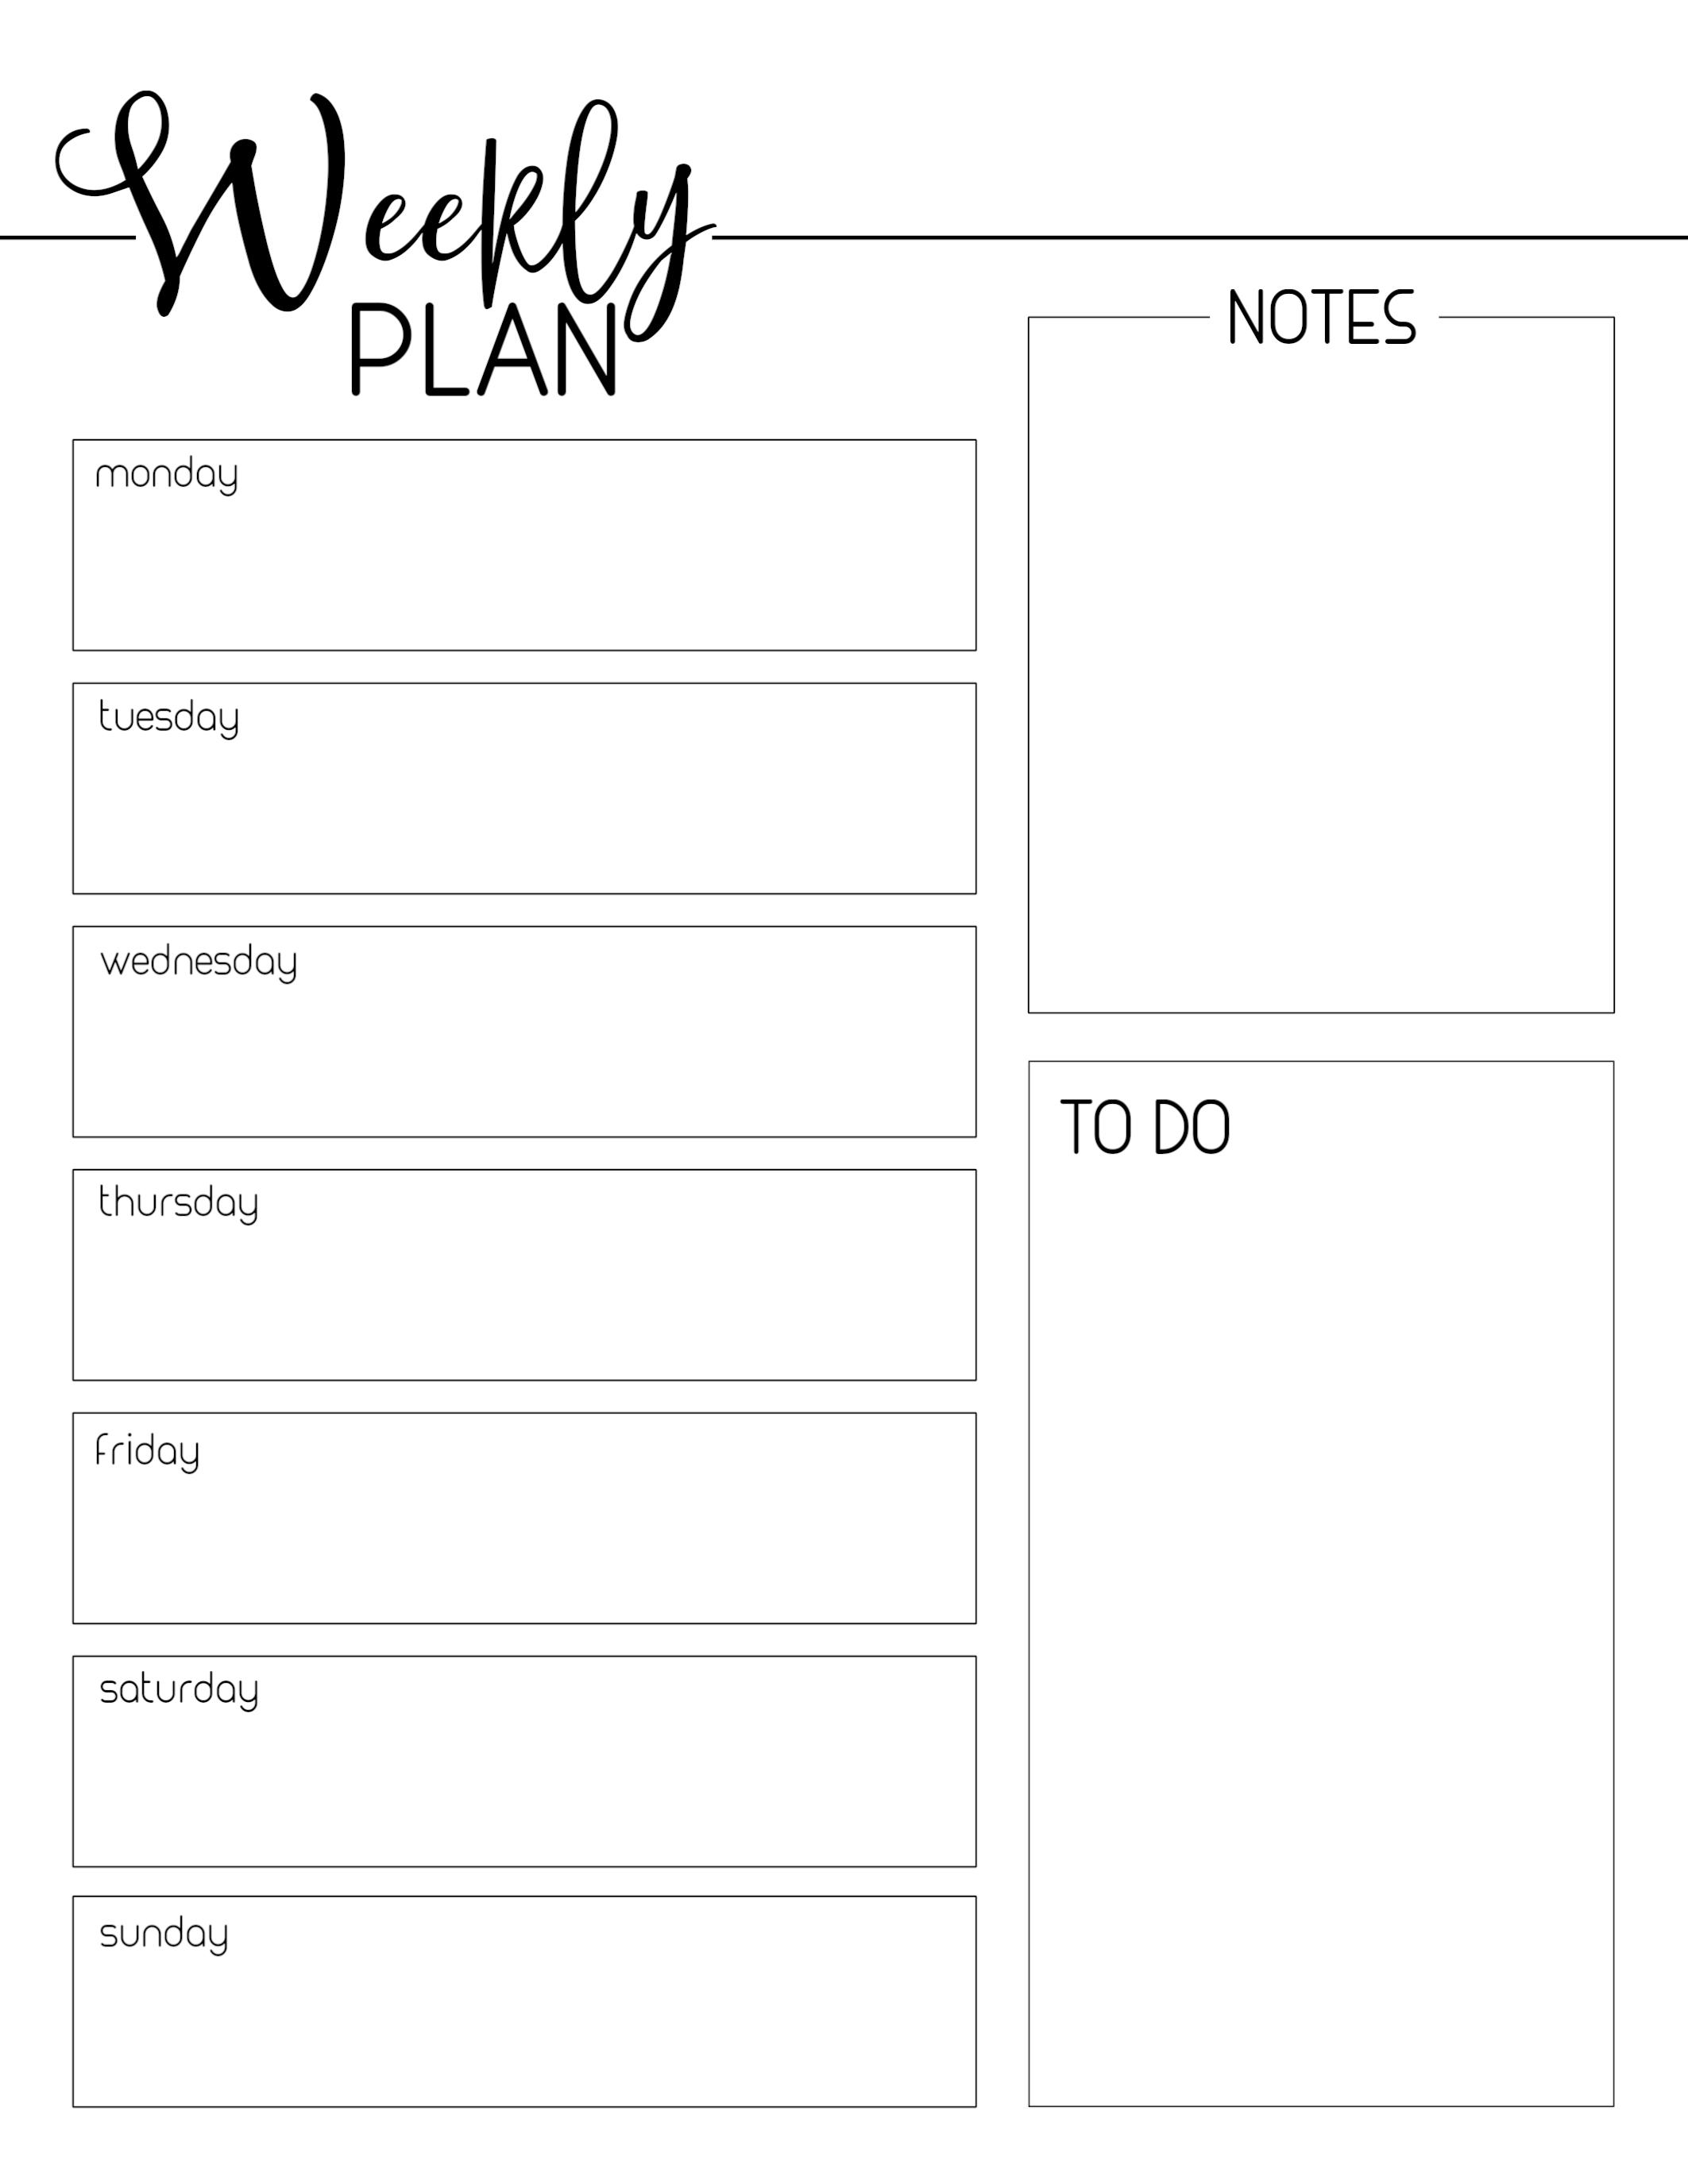 Free Printable Weekly Planner Template Schedule Paper Trail Design inside Free Printable Weekly Planner Templates